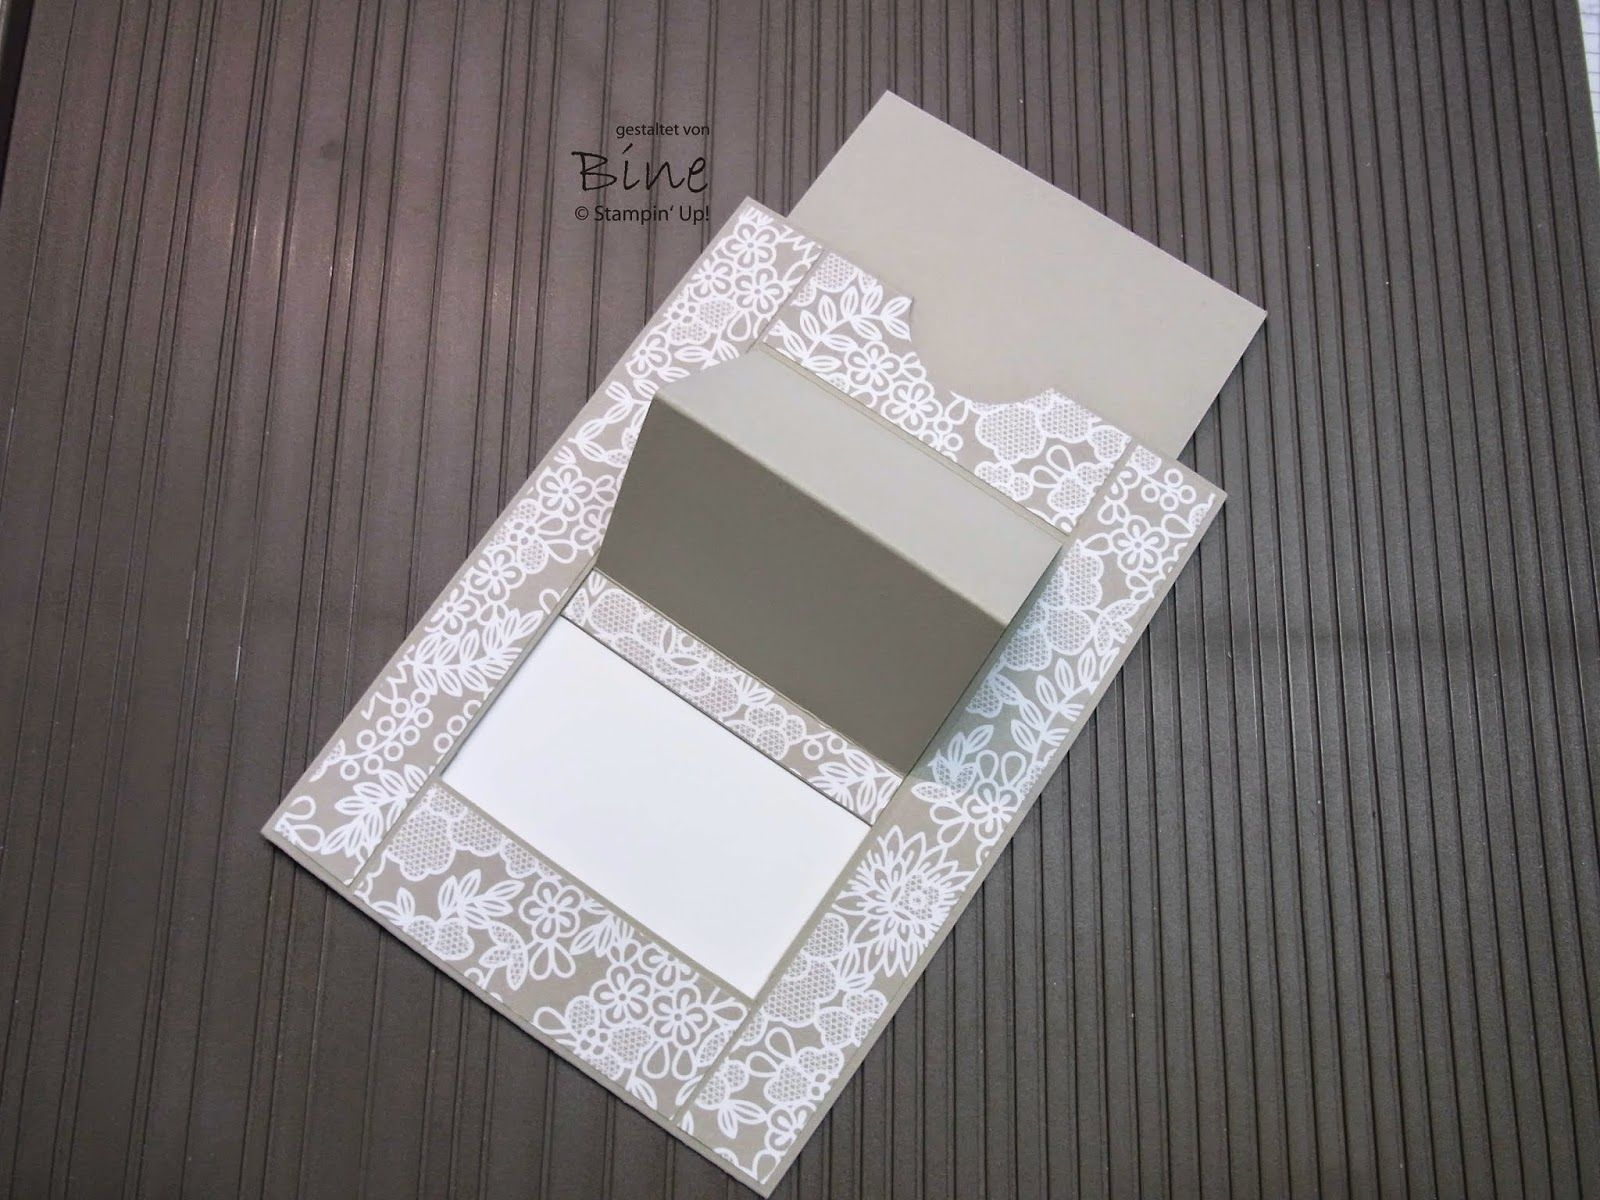 bines karten und mehr anleitung ziehkarte. Black Bedroom Furniture Sets. Home Design Ideas